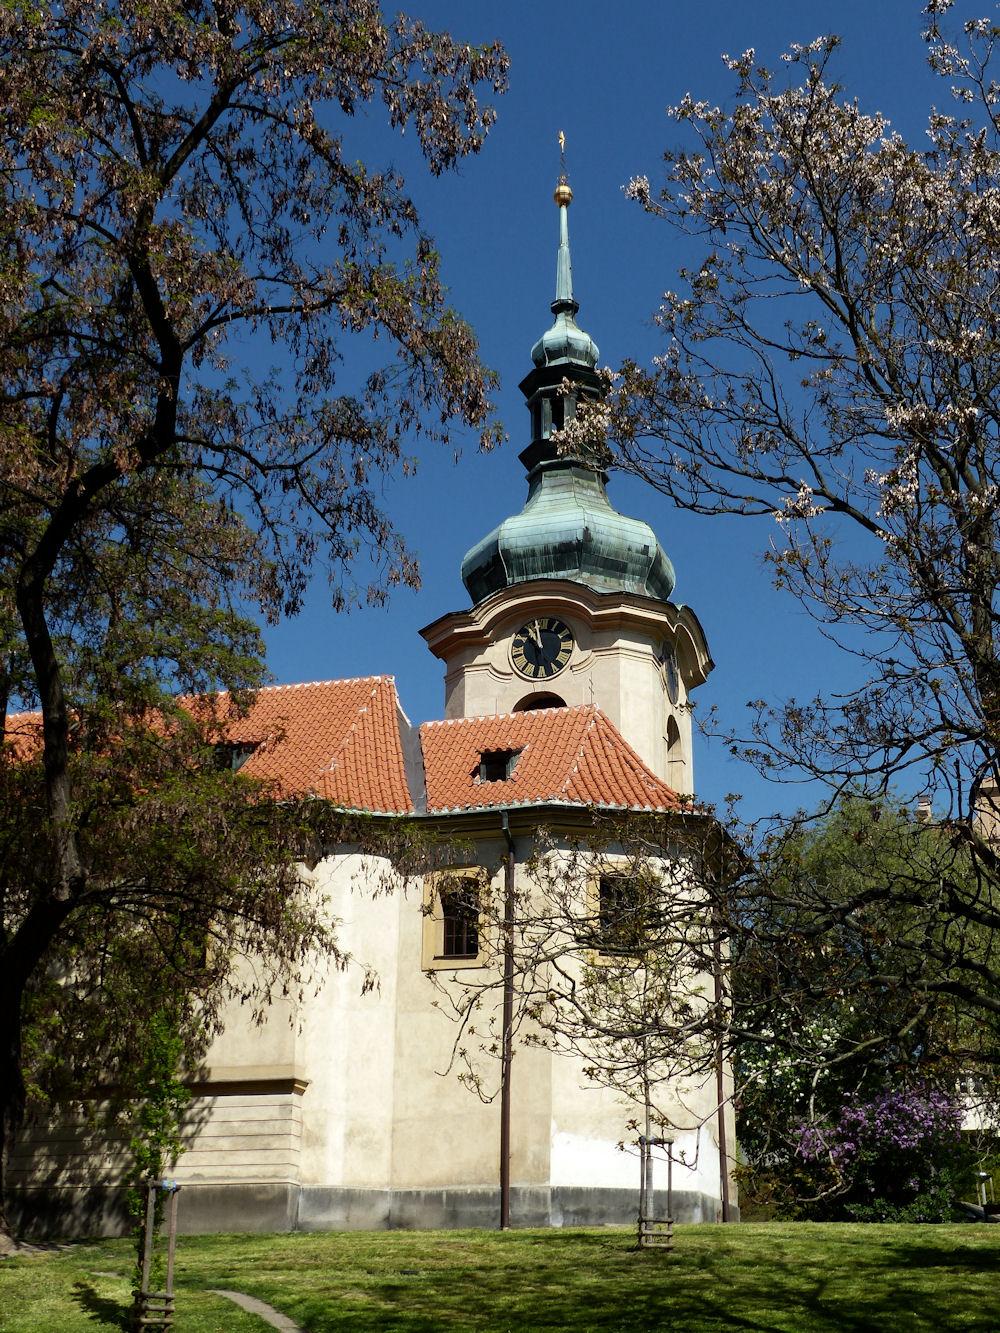 Saint Nicholas, Vrsovice